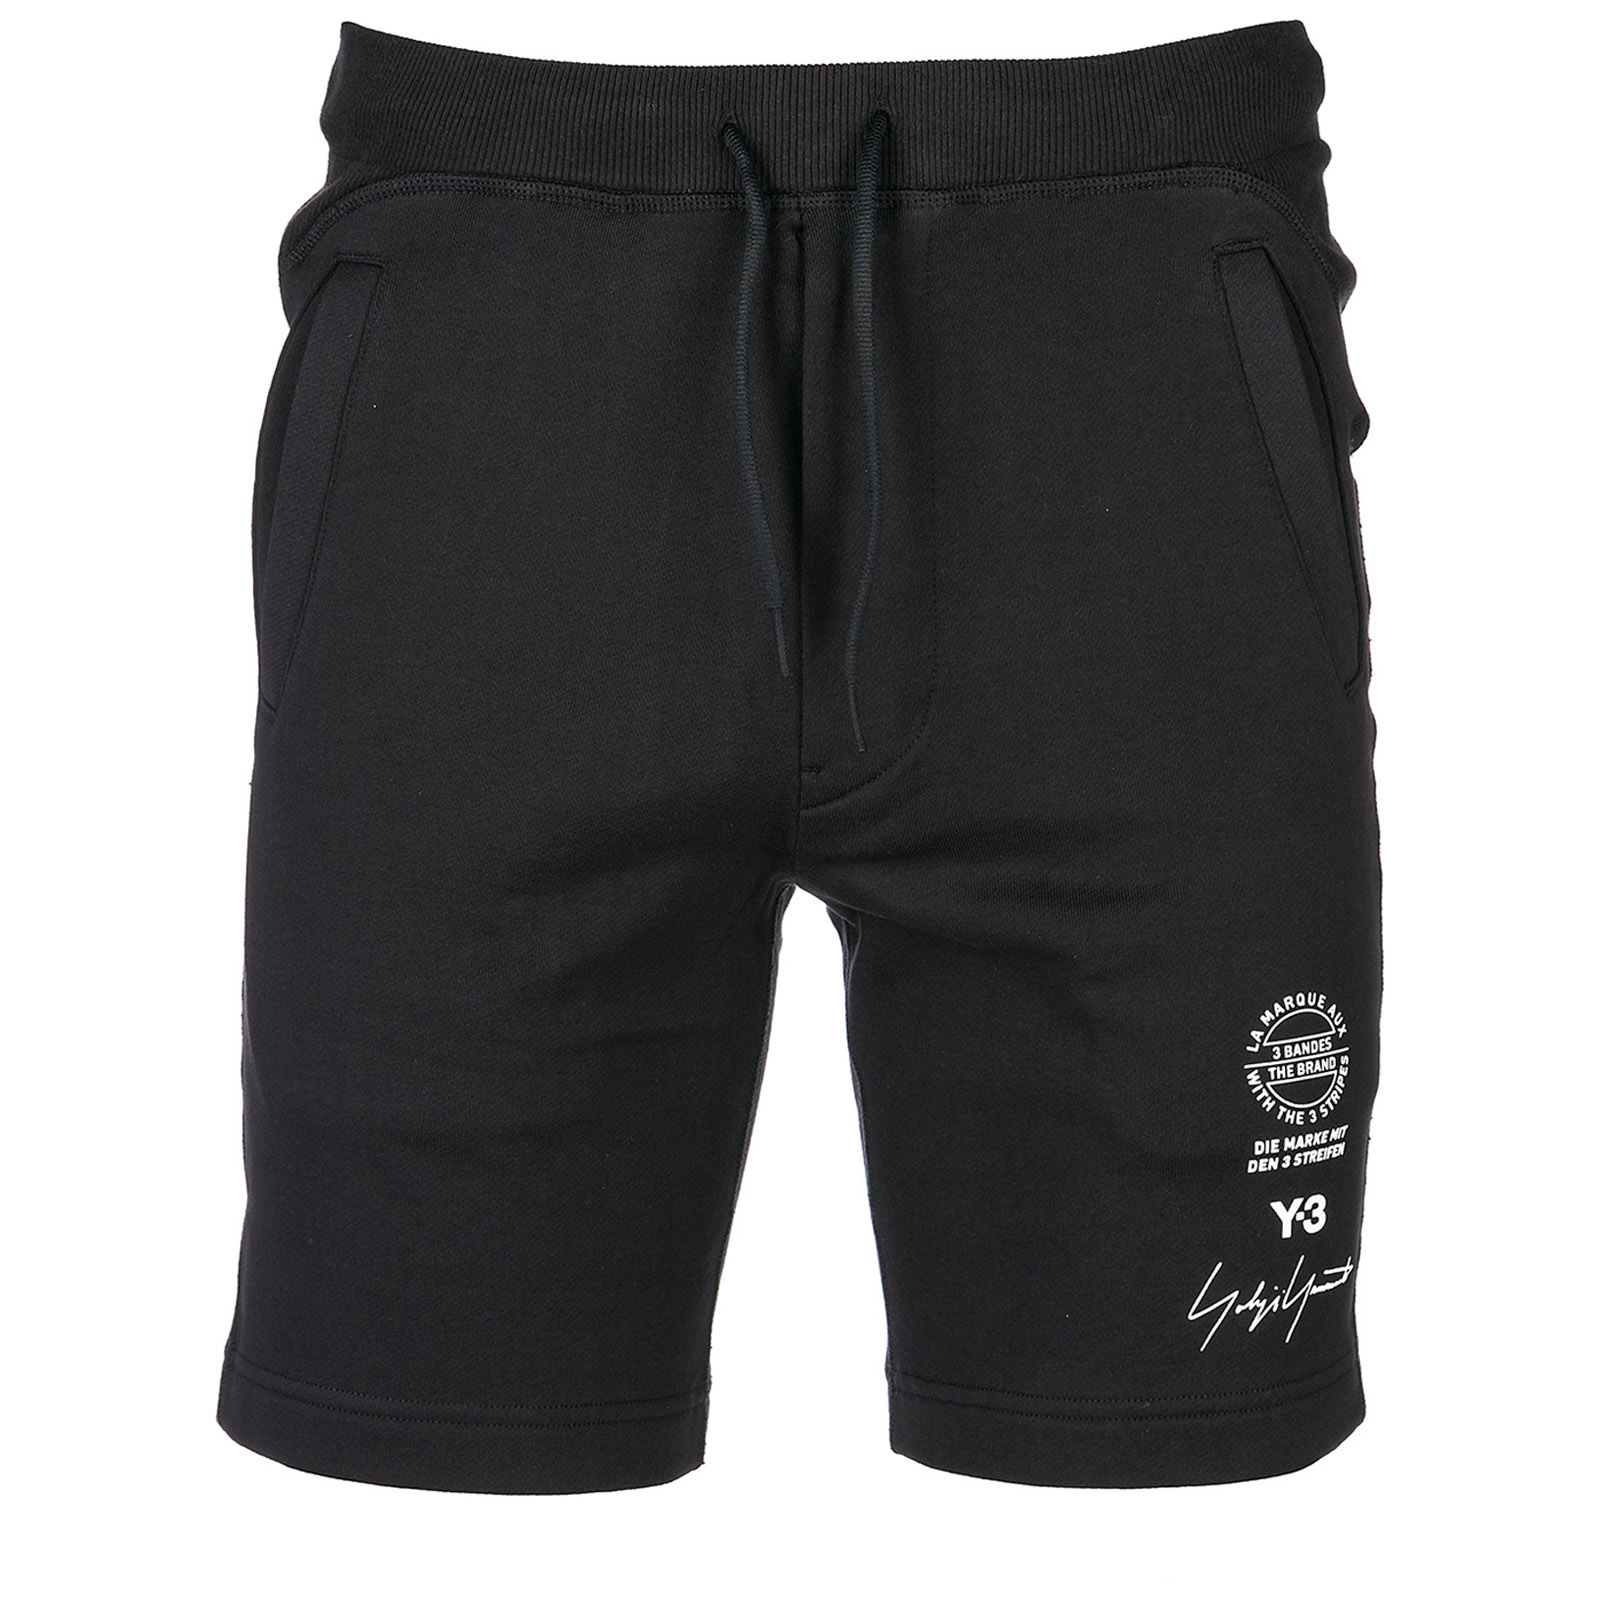 Bermuda shorts pantaloncini uomo graphic street